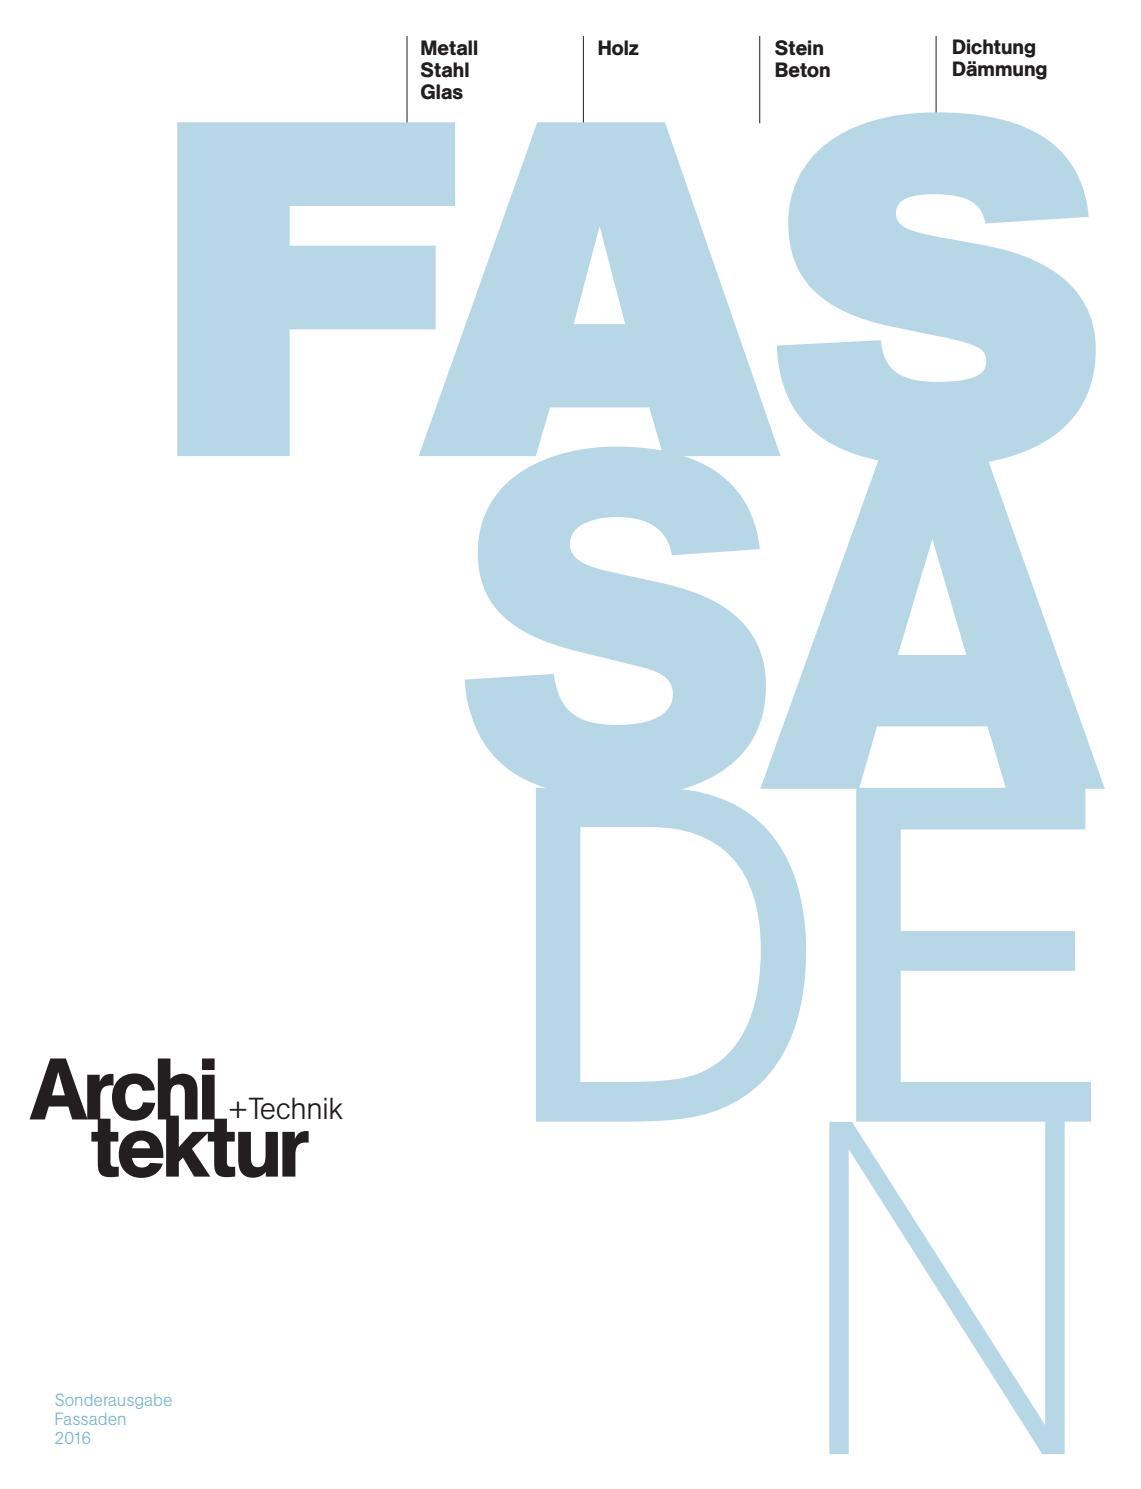 Architektur+Technik Fassaden 2016 by BL Verlag AG - issuu